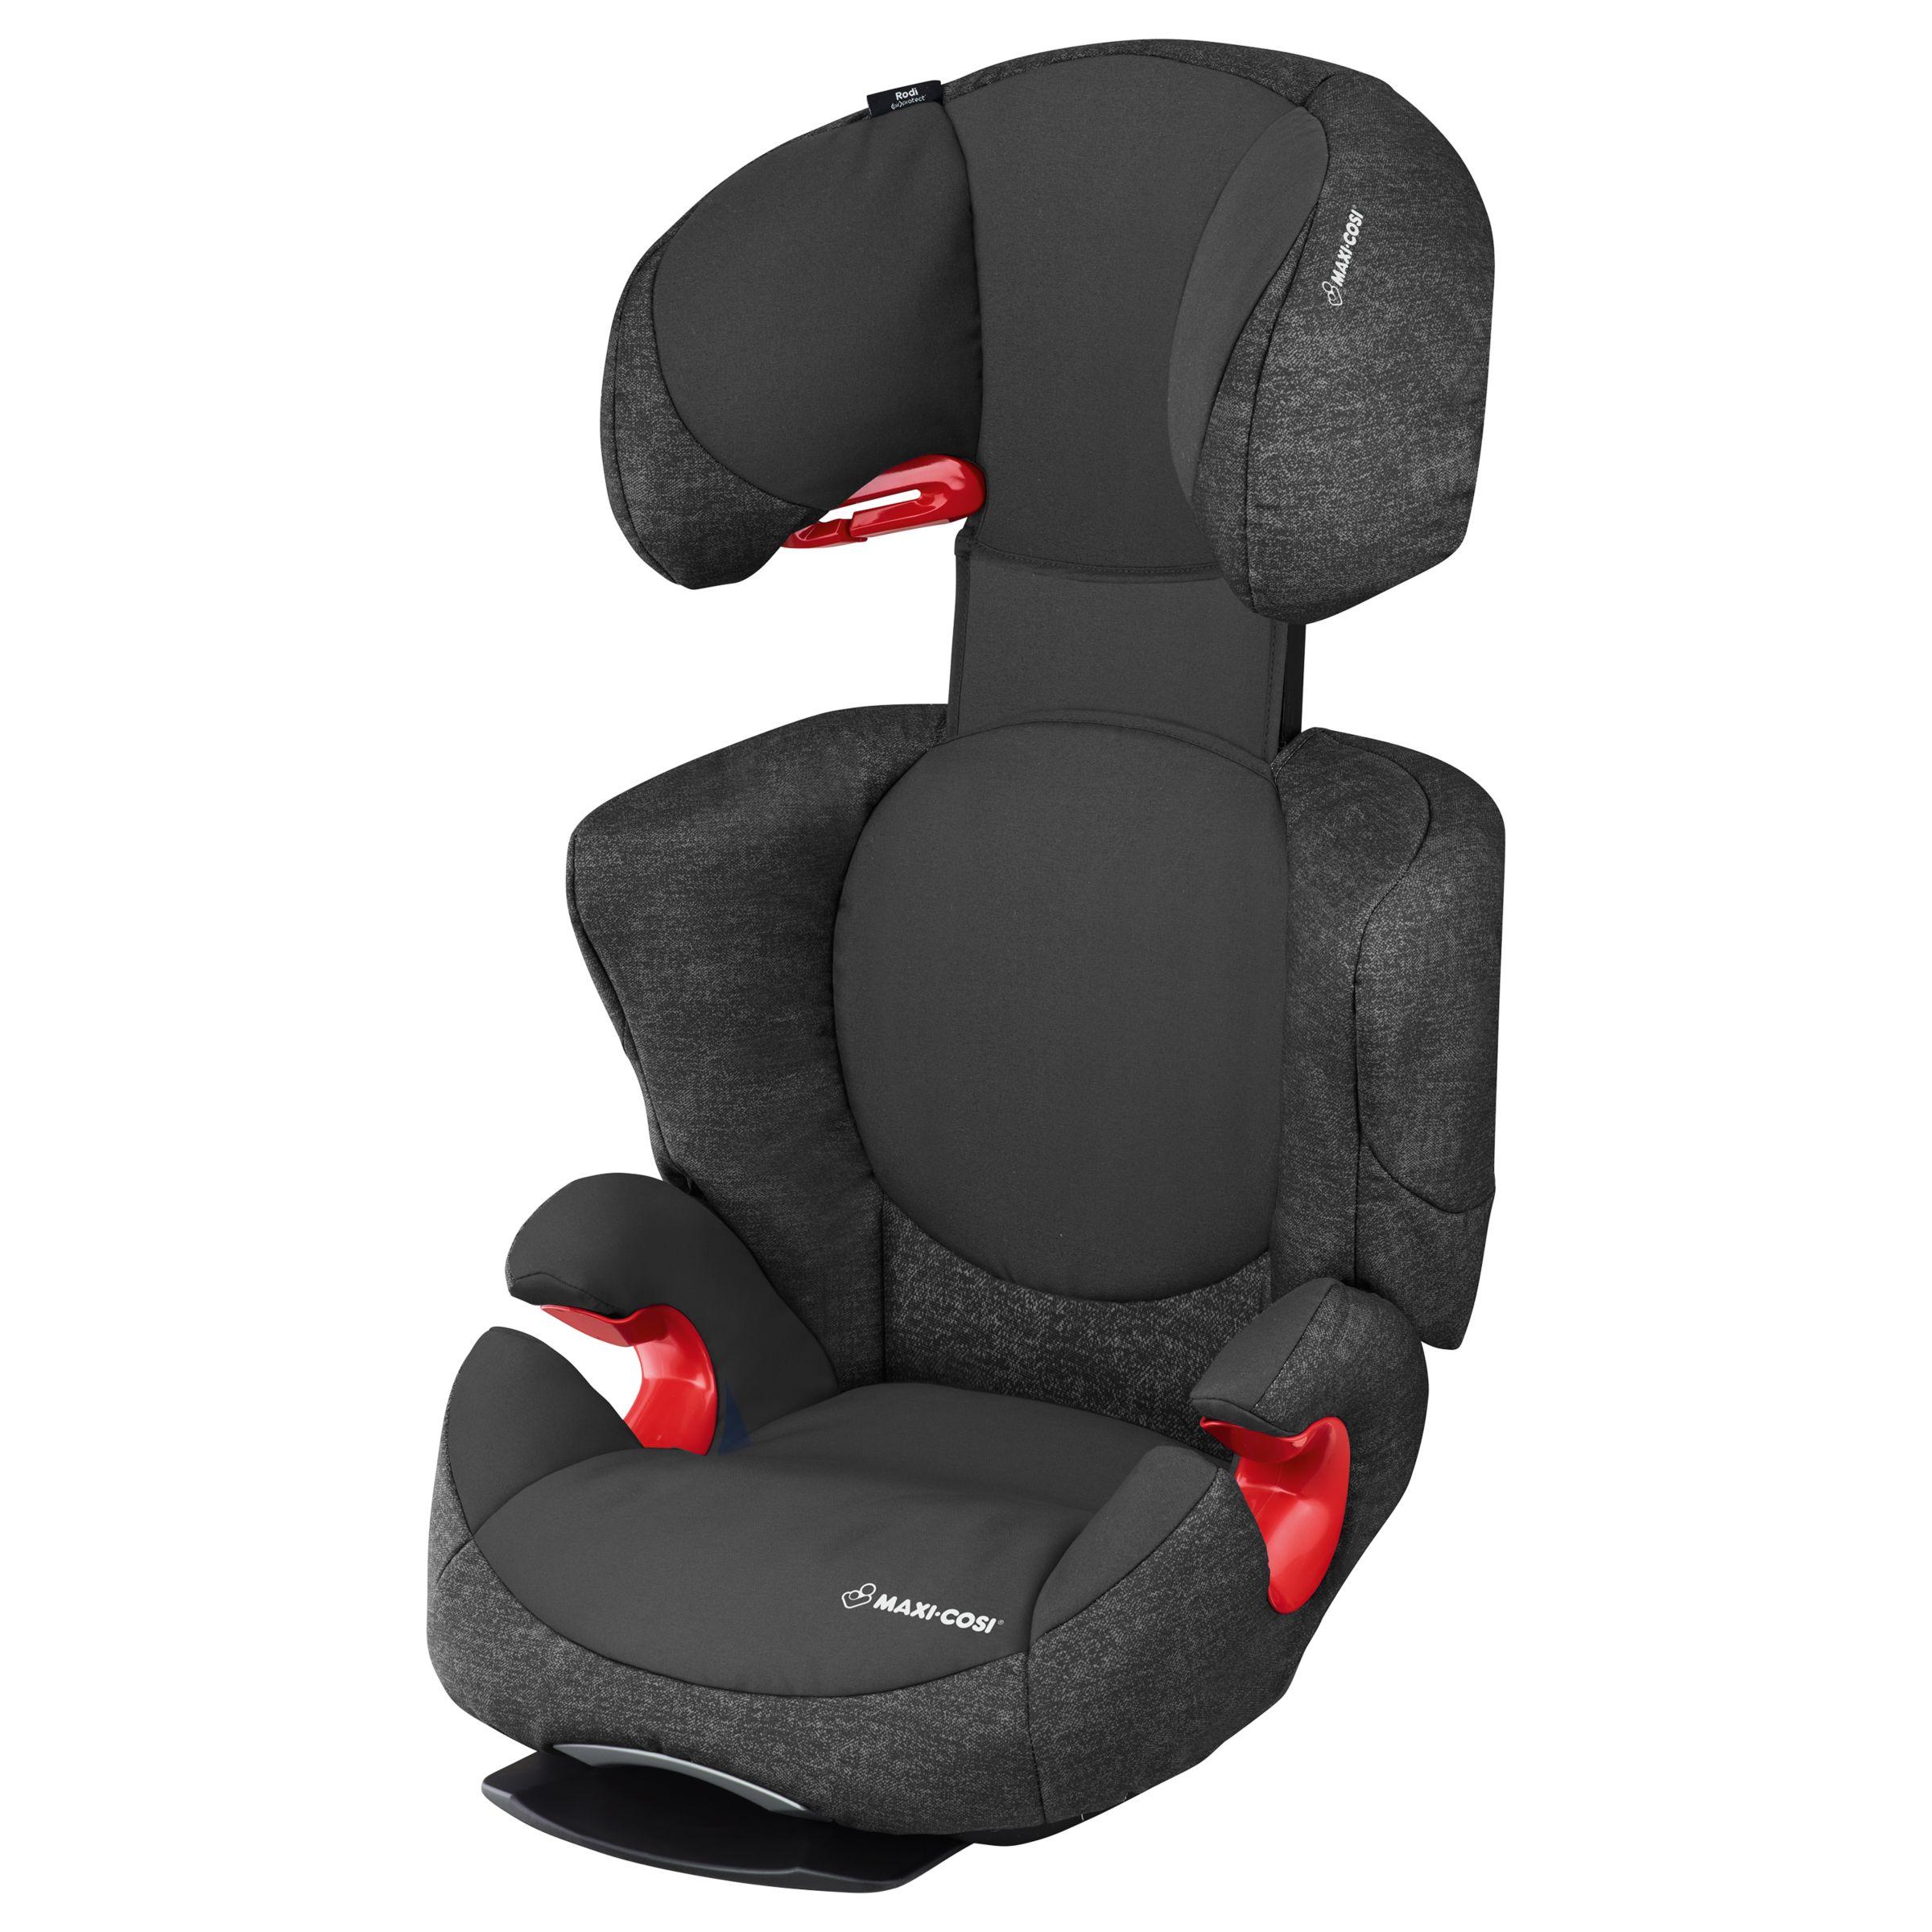 Maxi-Cosi Maxi-Cosi Rodi Air Protect Group 2/3 Car Seat, Nomad Black